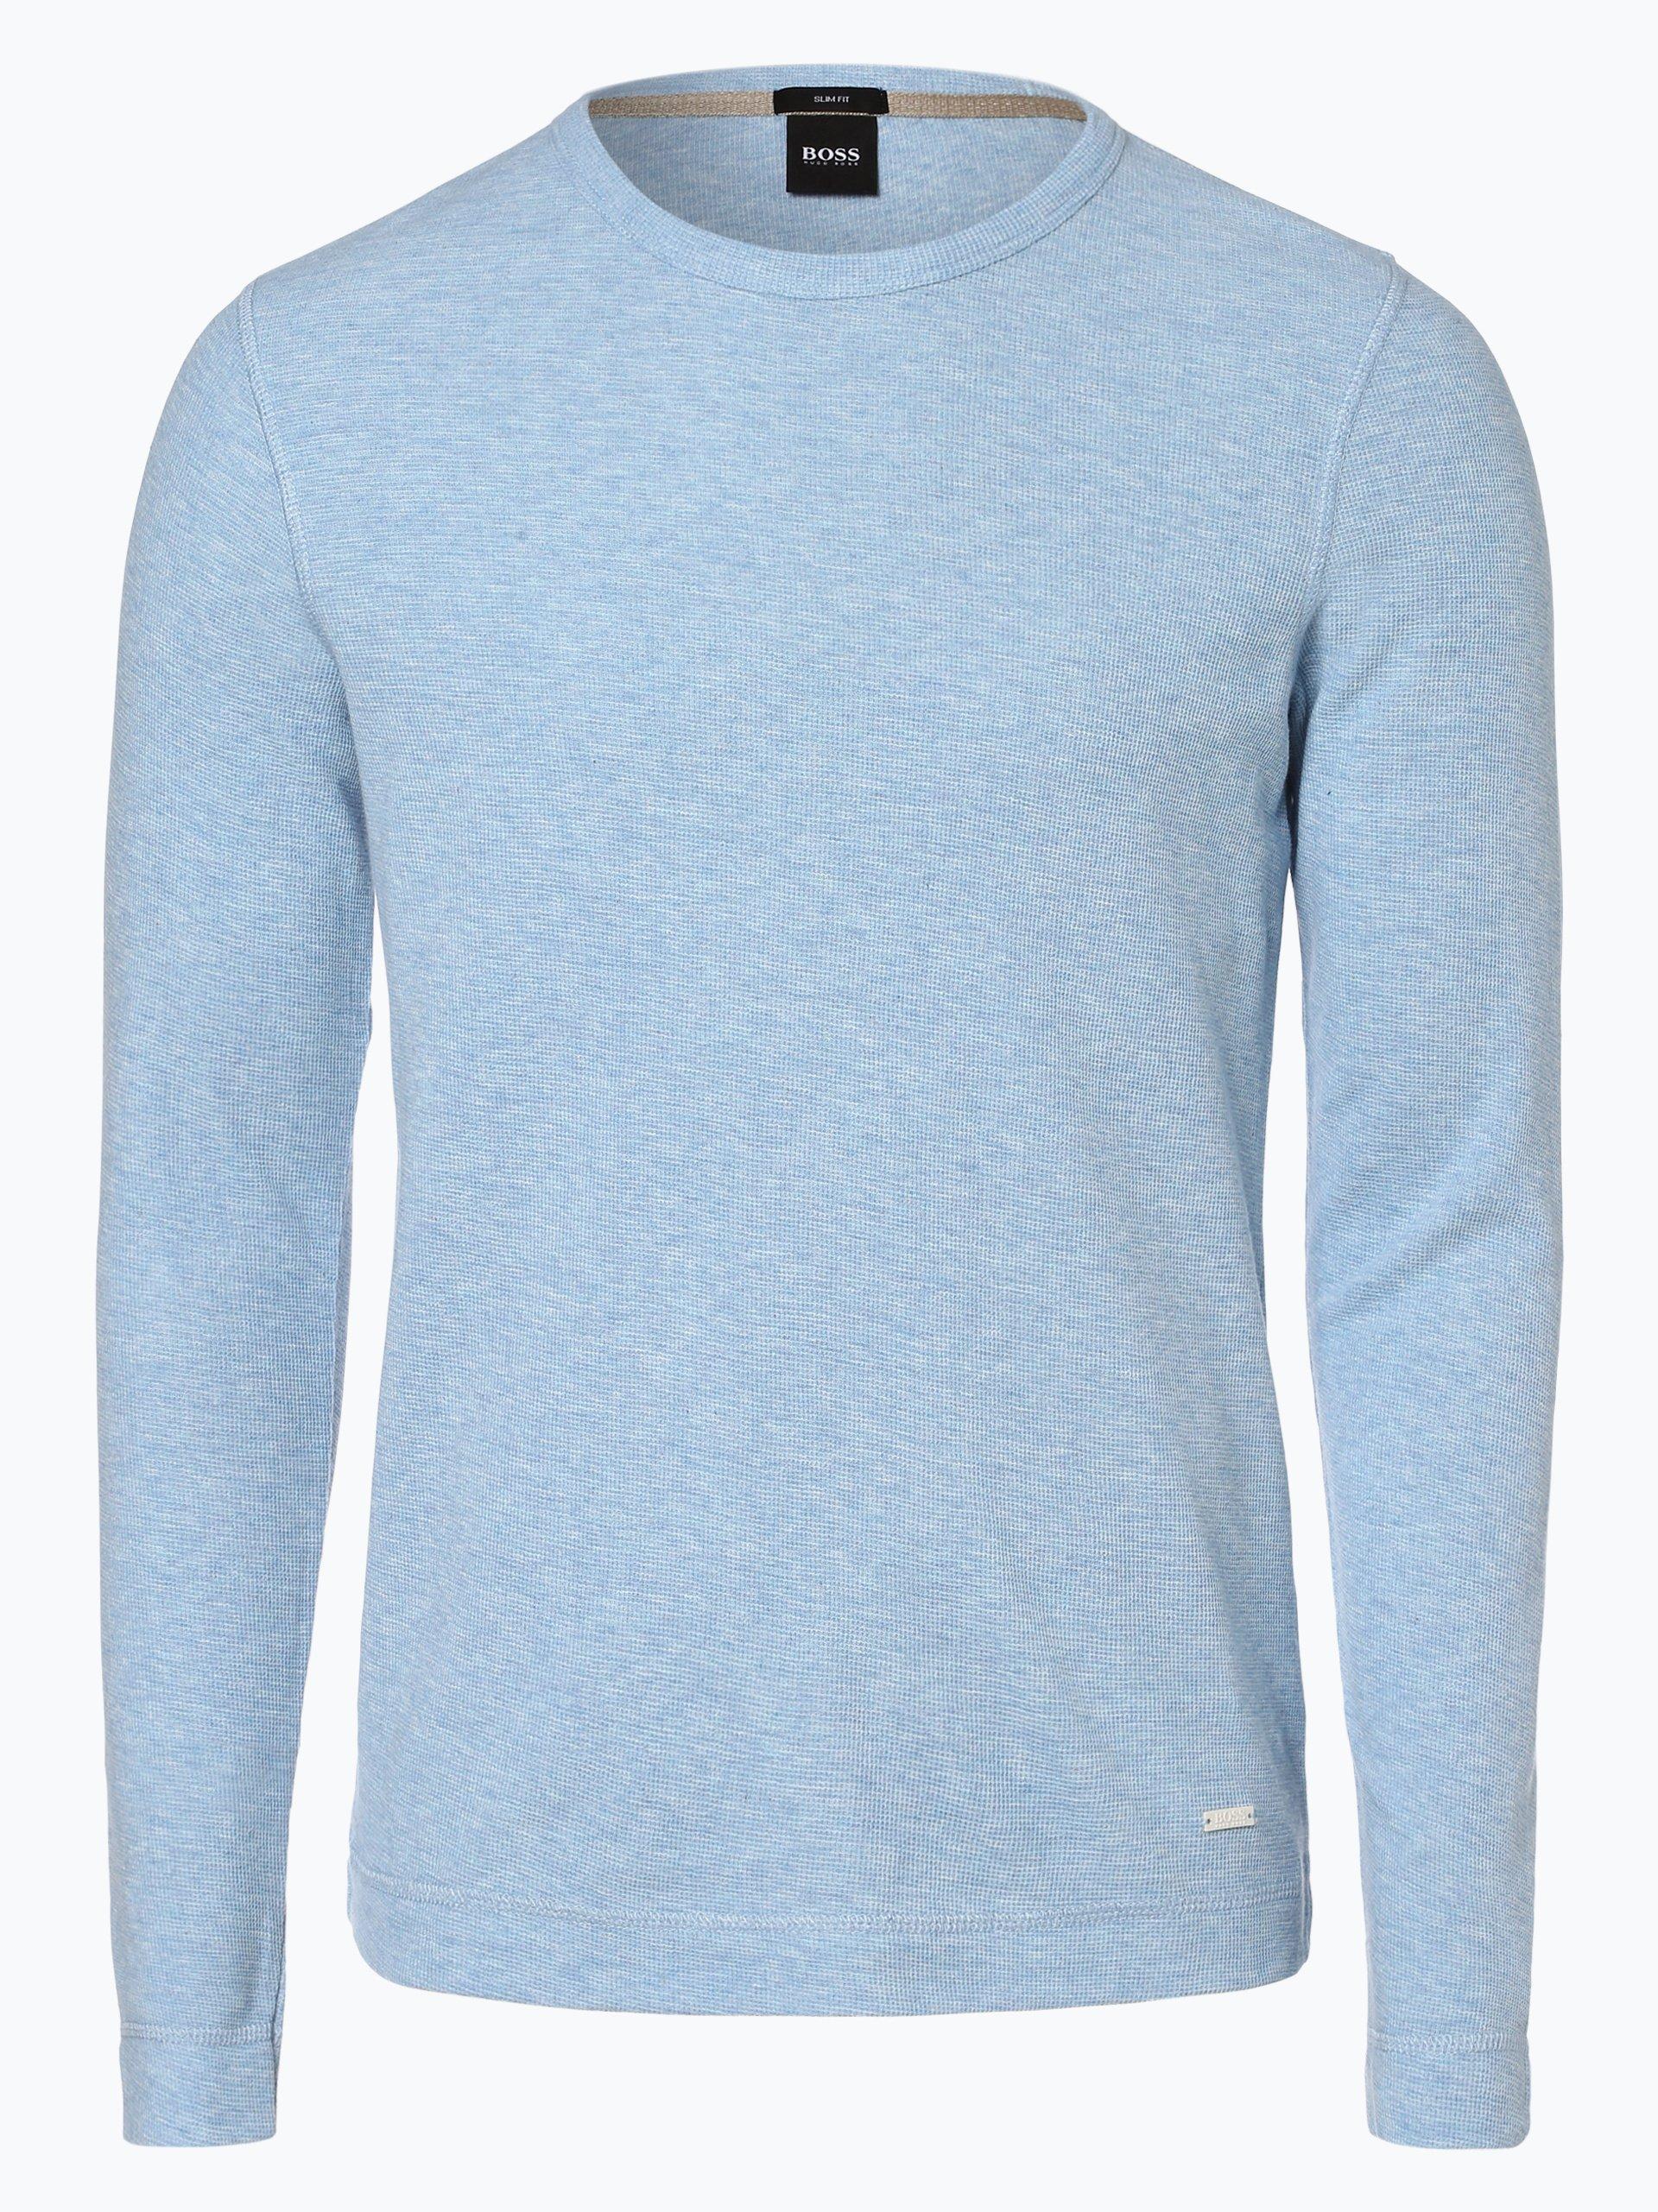 BOSS Casual Męska koszulka z długim rękawem – Tempest